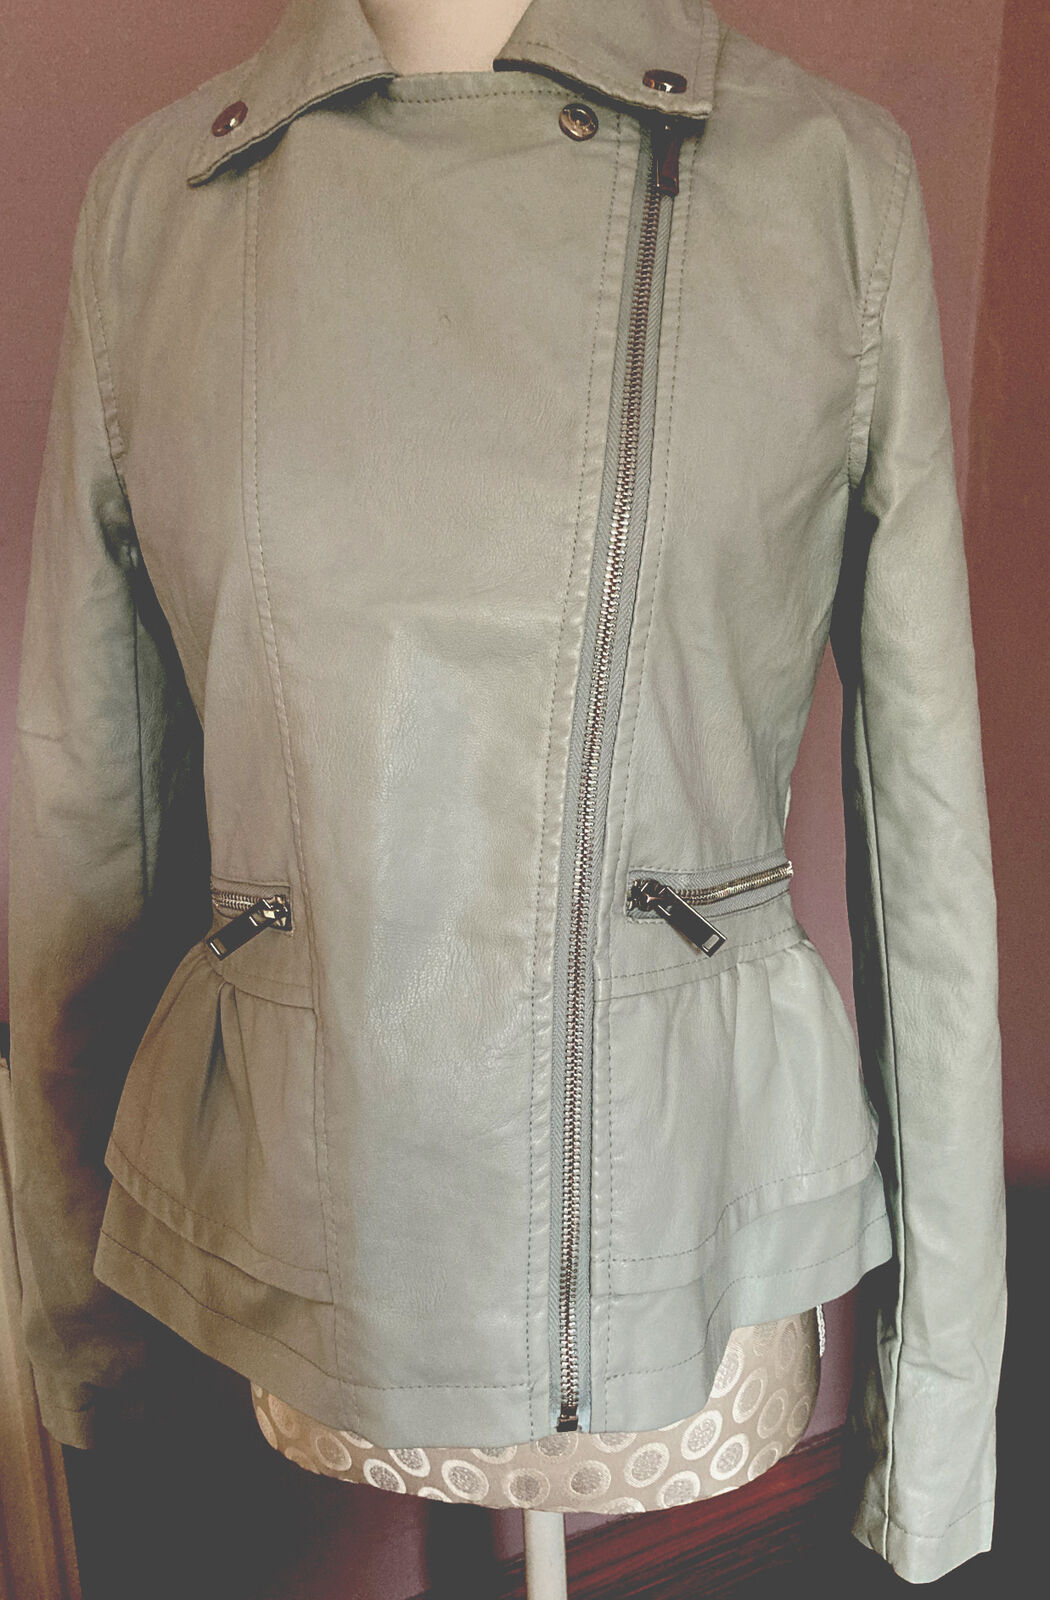 Boo Hoo Fake Leather Jacket Pale Green 10 Zip Pockets Biker Style V G Condi